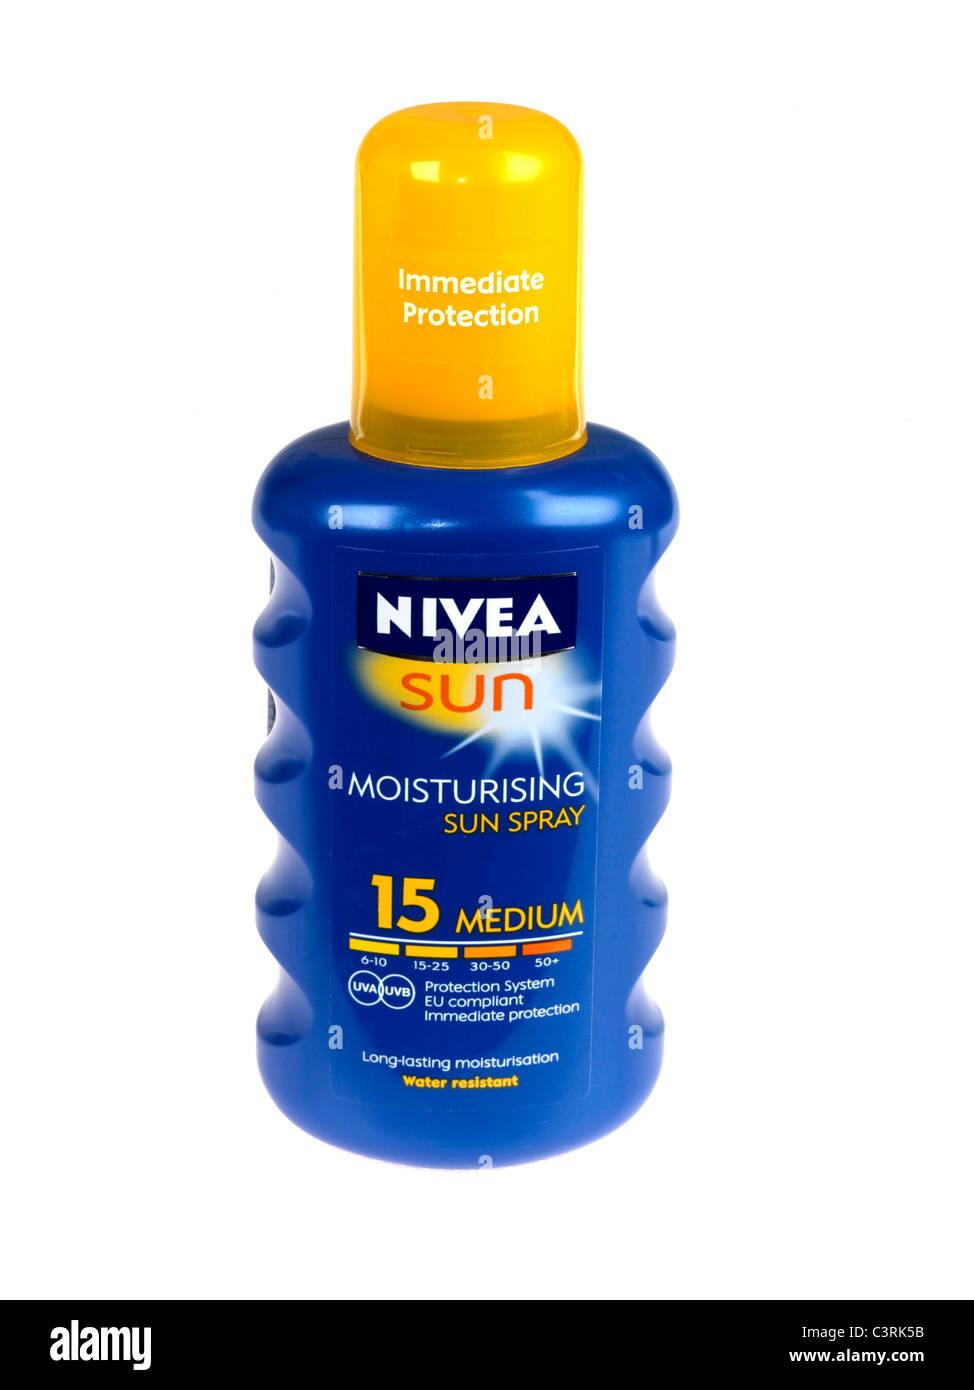 Nivea Sun Spray - Stock Image